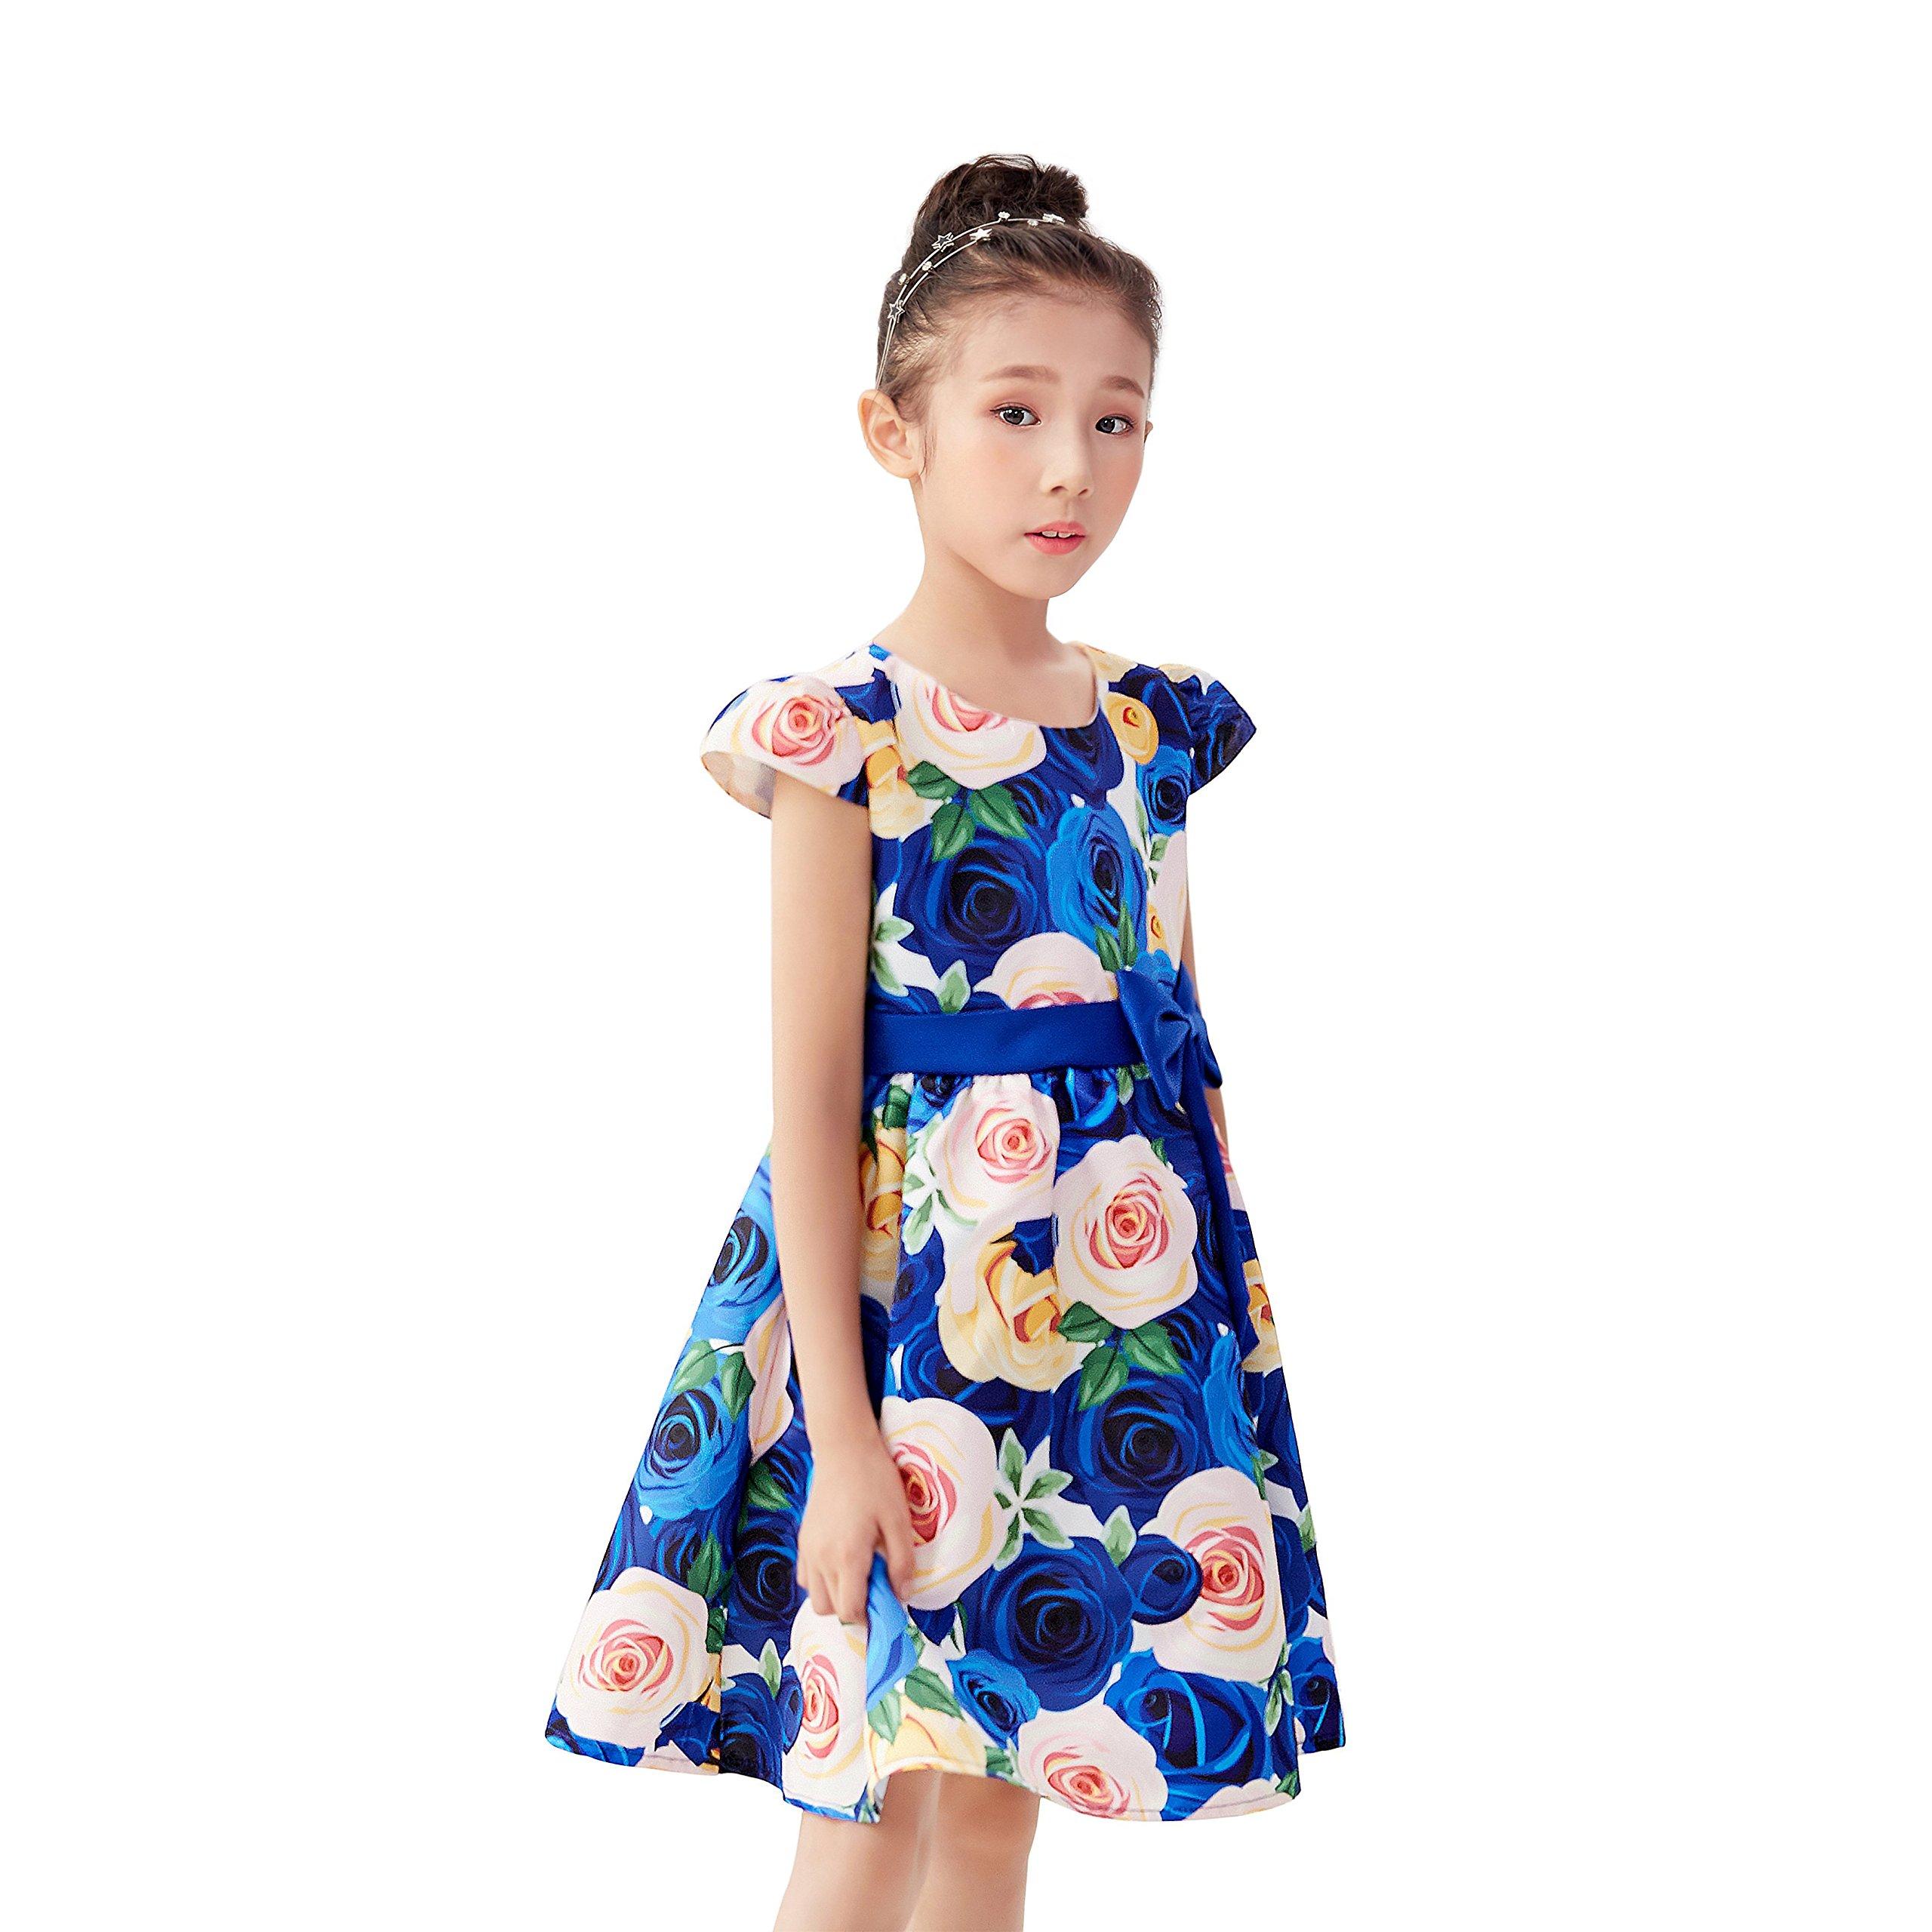 Kids Dresses 7-8 Dresses for Kids 7T Flower Girl Dress Girls Summer Clothes Girls Gifts Special Occasion Dresses for Girls Size 7 (Blue Rose, 7)